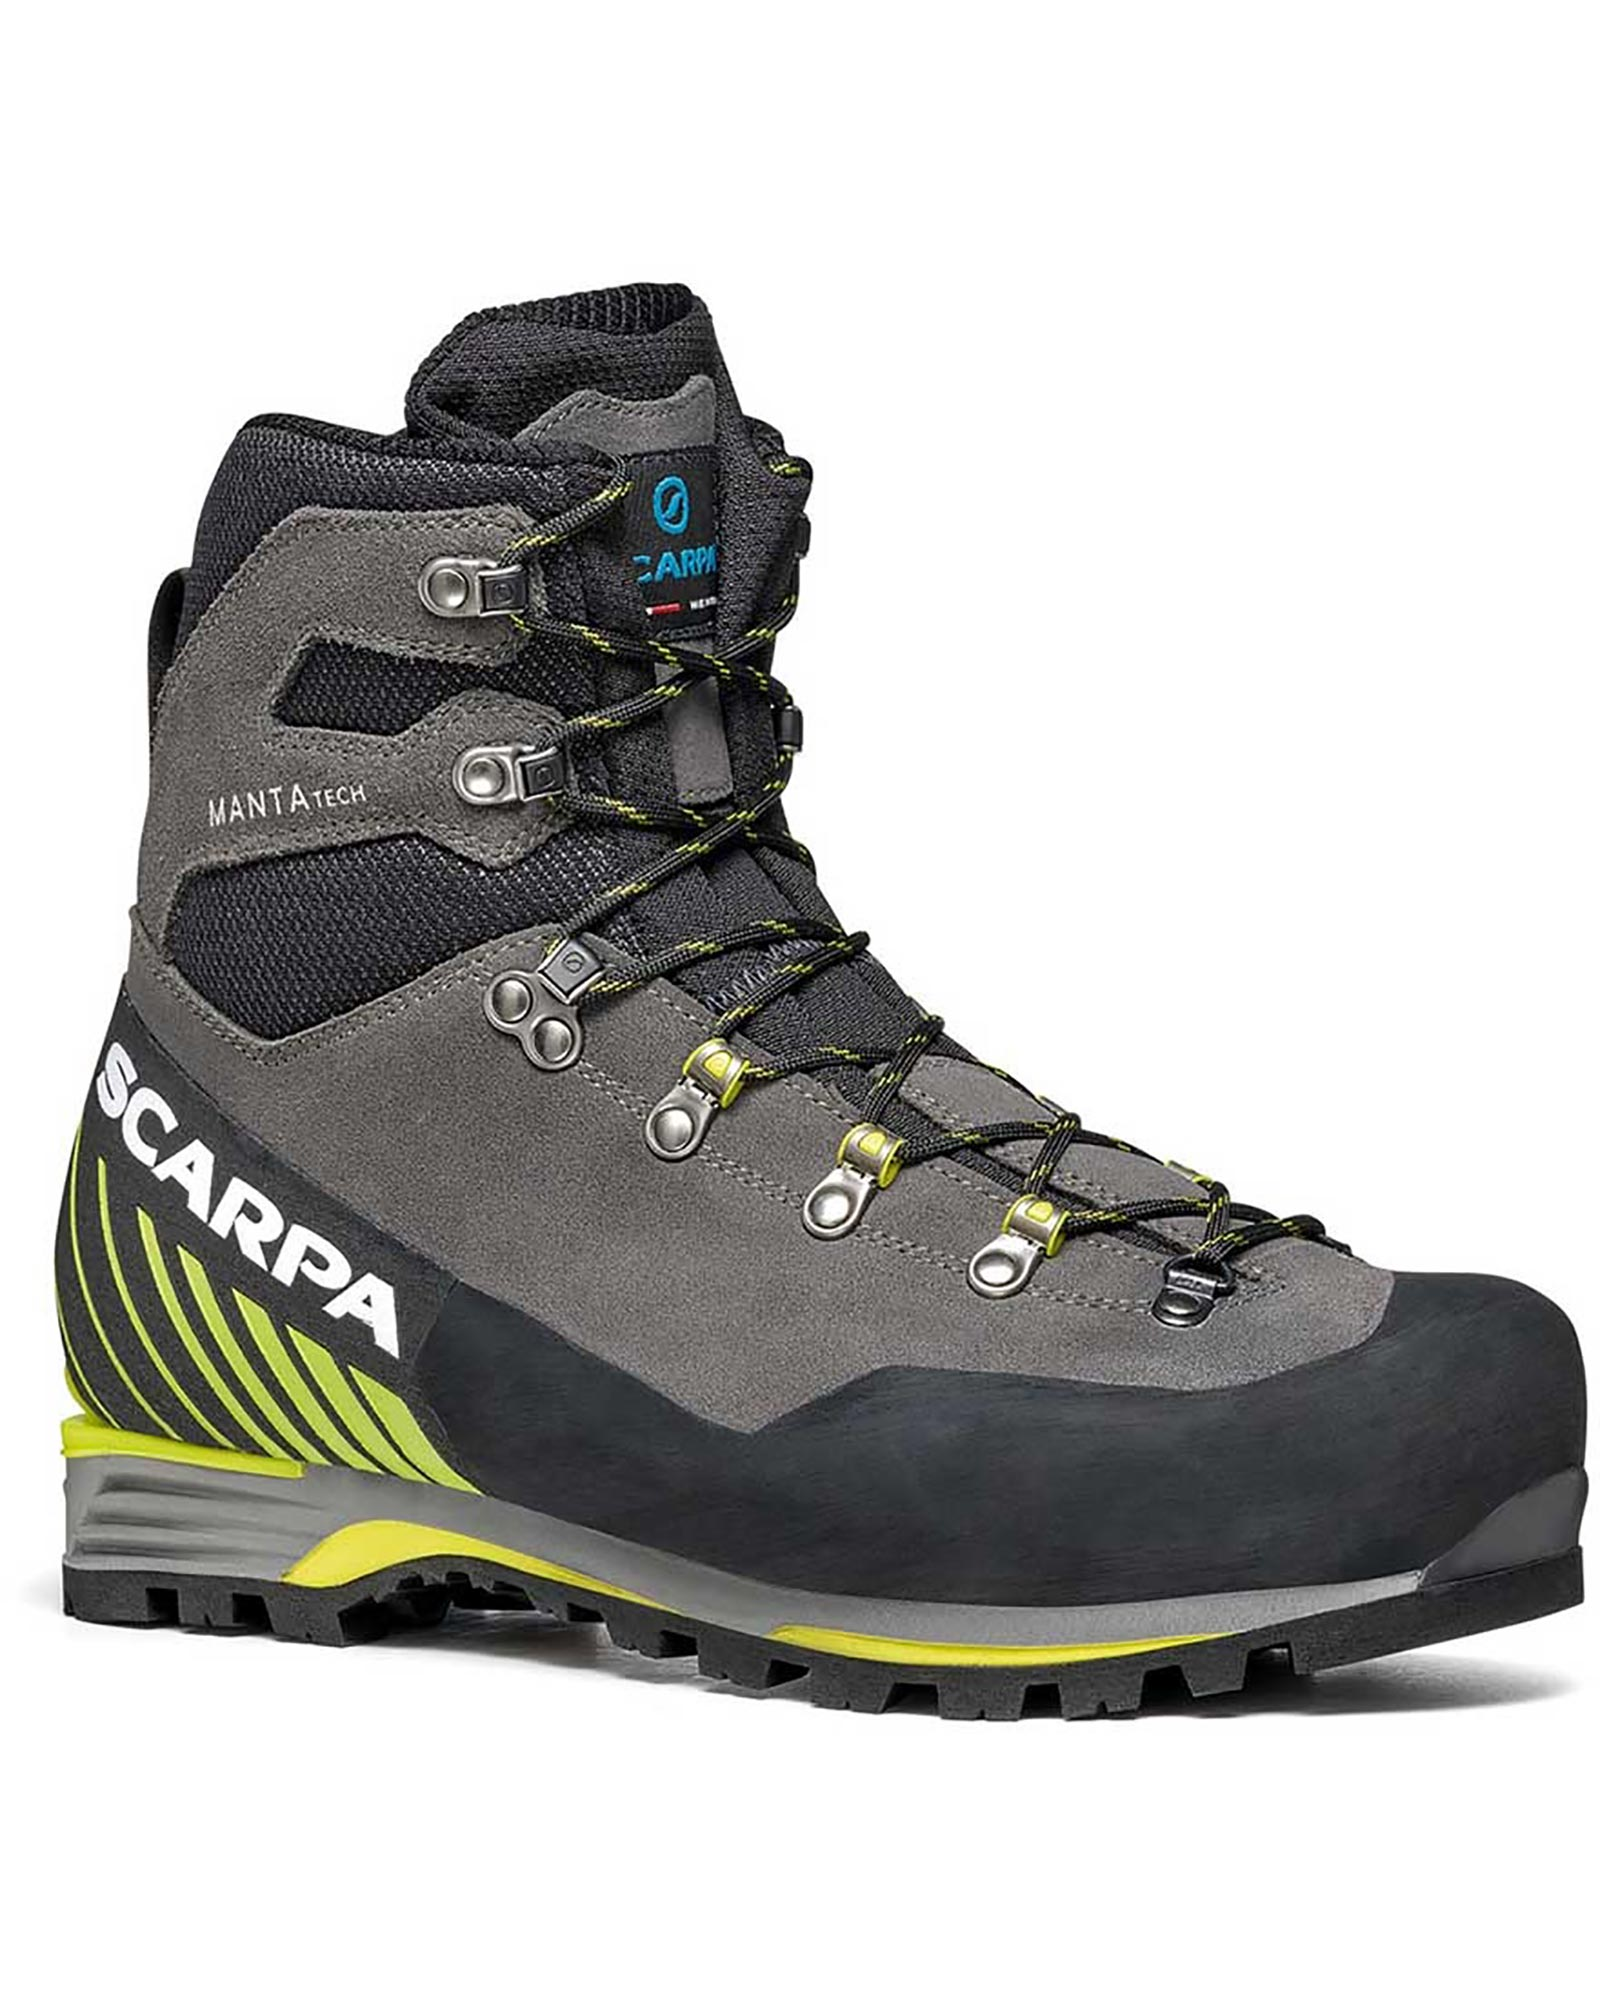 Scarpa Men's Manta Tech GORE-TEX Mountaineering Boots 0